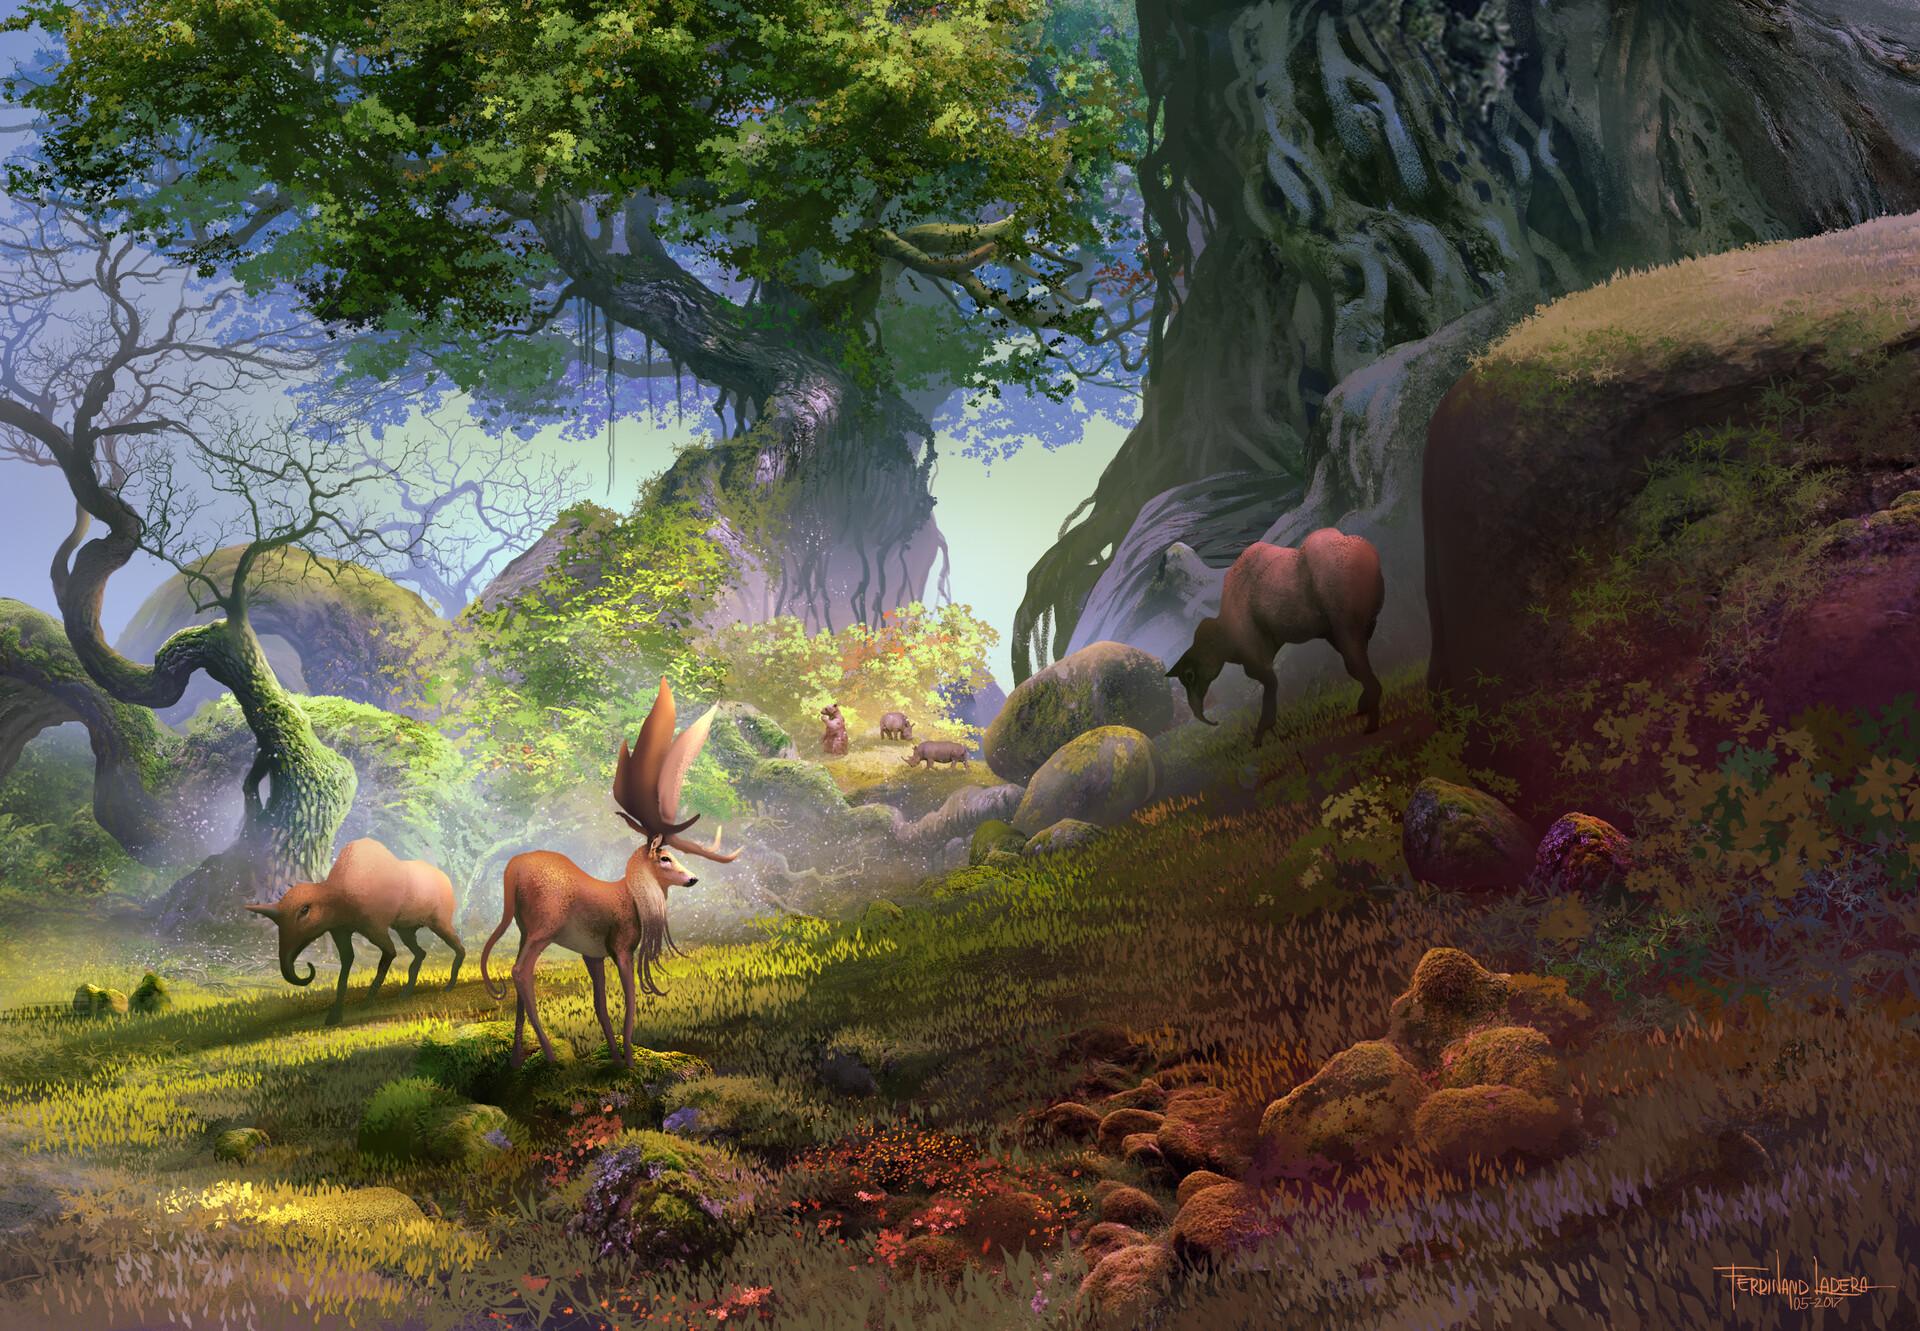 Ferdinand ladera druids